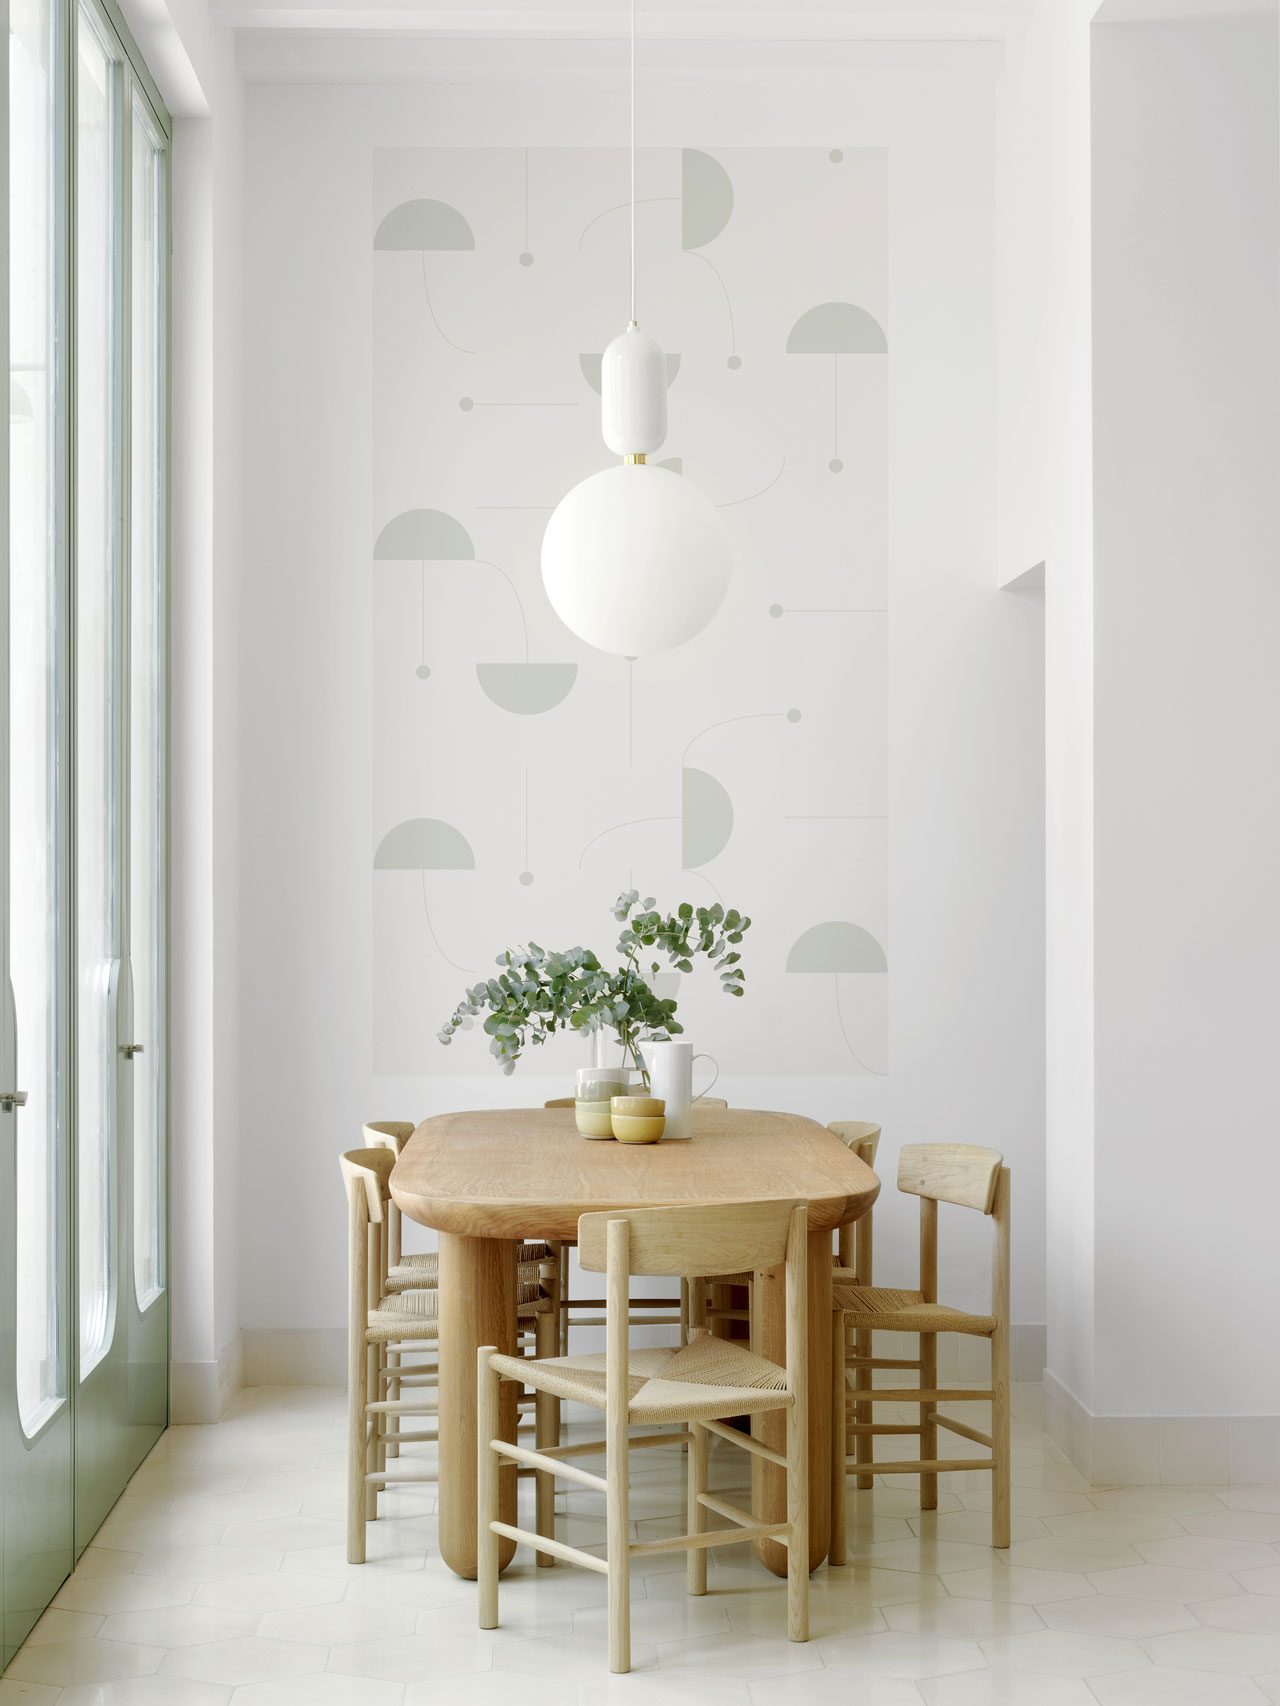 Ung young swedish design pa stockholmsmassan